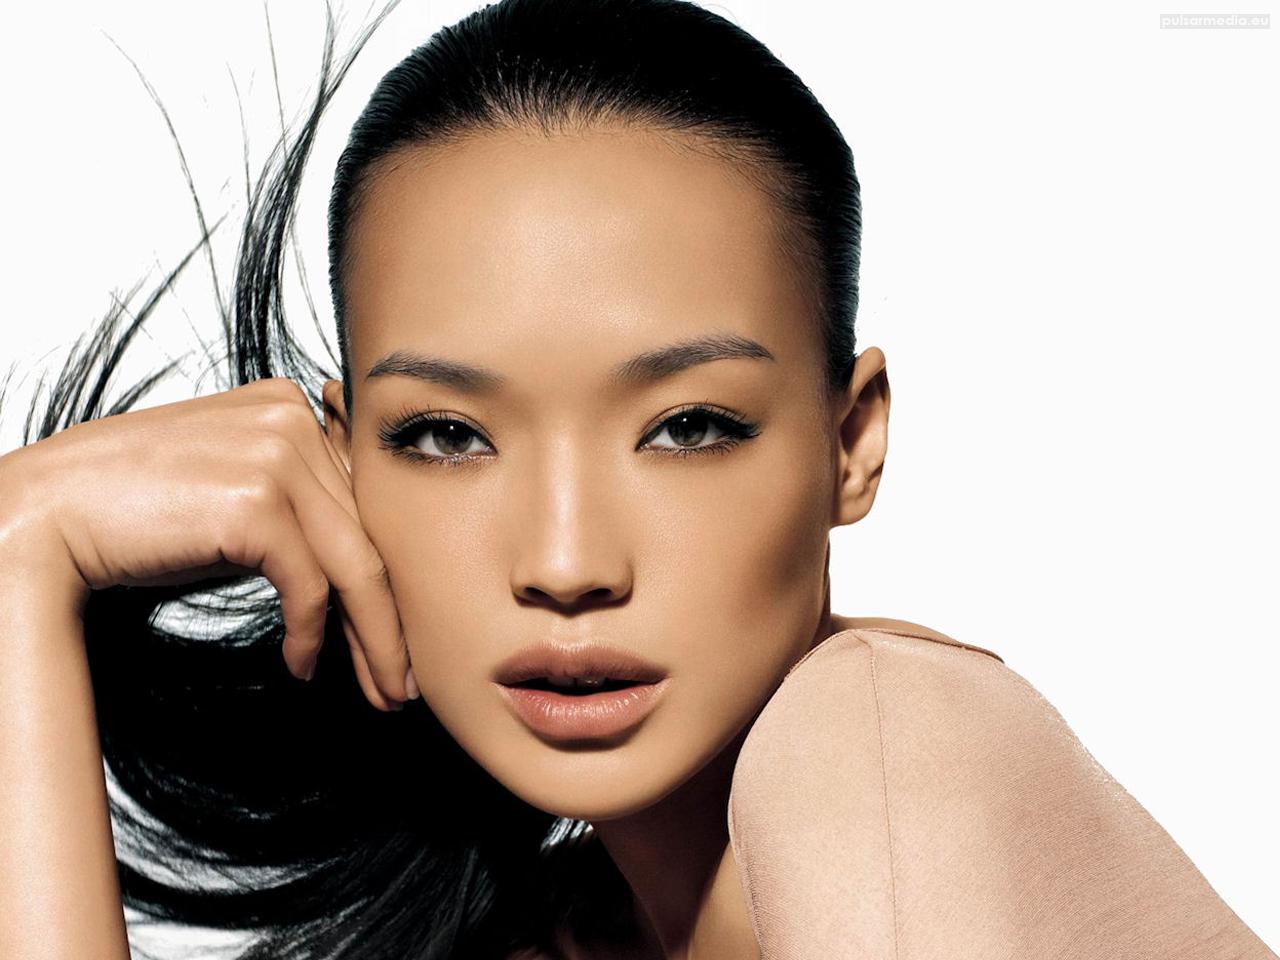 http://1.bp.blogspot.com/-yQA_WSwdG5w/T-ybp1L4pDI/AAAAAAAAGxY/e4ad2Q6-ENM/s1600/hot-chines-actress-shu-qi+(7).jpg